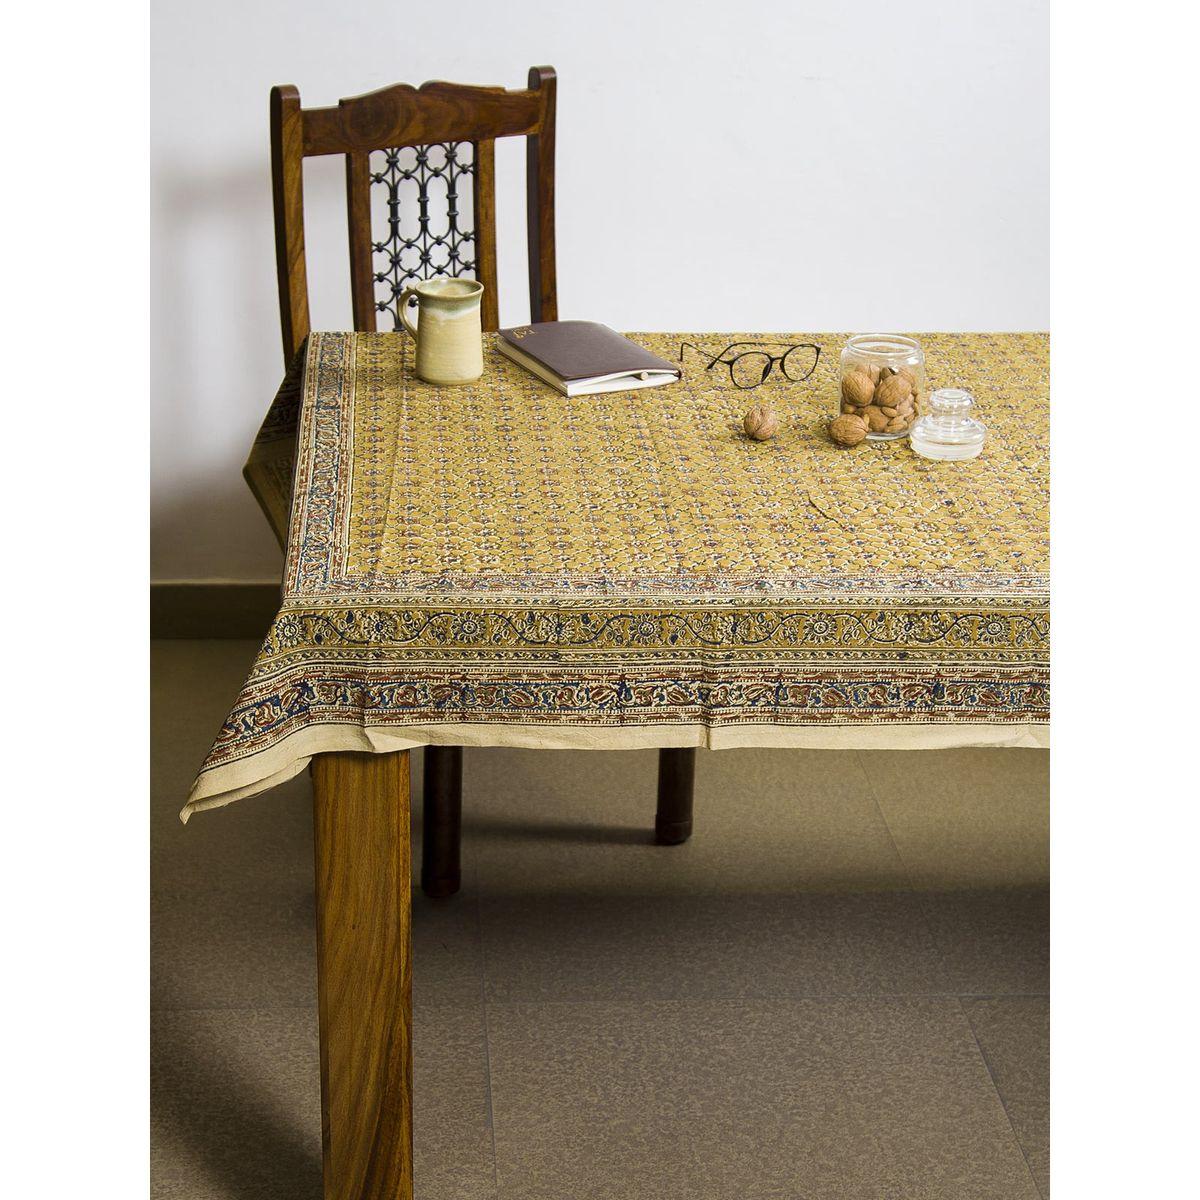 Dijon Vayati Kalamkari 6 seater table cover